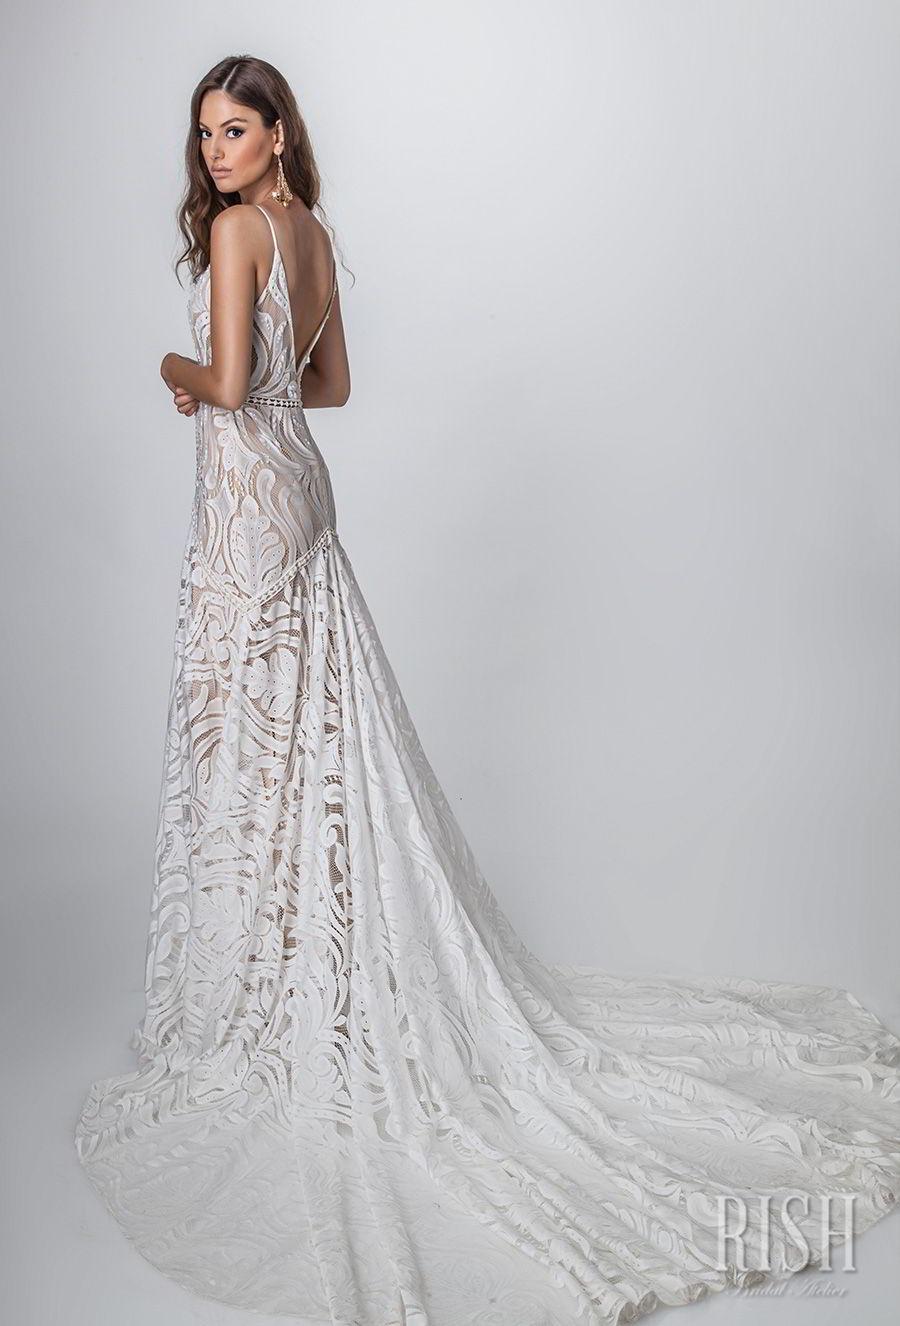 Rish Bridal Sun Dance 2018 Sleeveless Spaghetti Strap Deep Sweetheart Neckline Full Embellishment Bohemian Glamorous Sheath